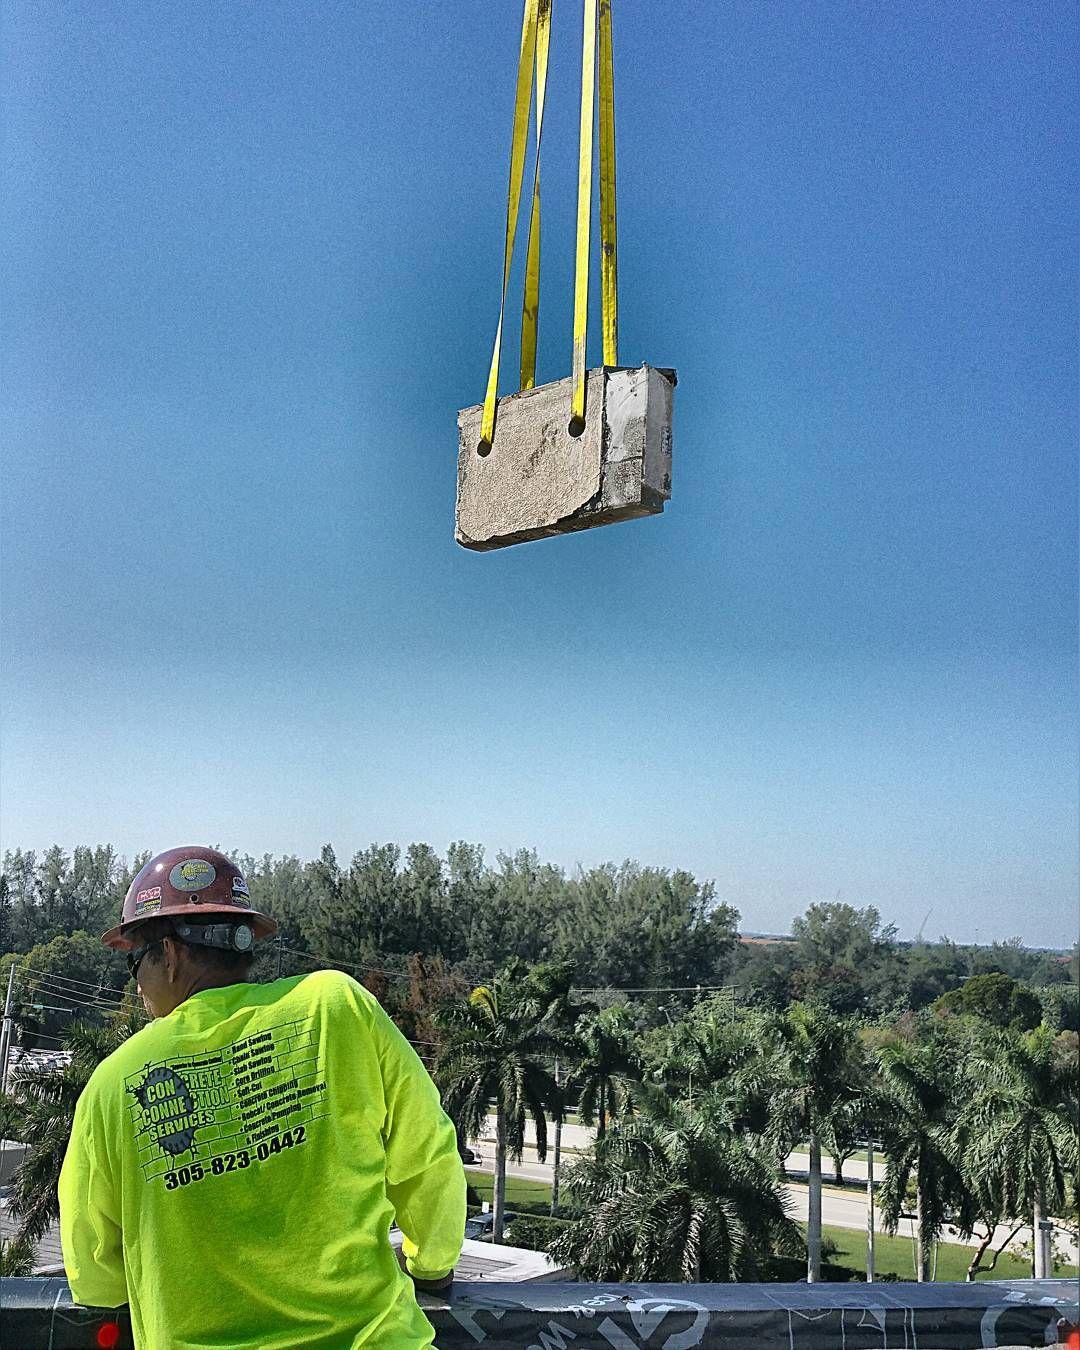 Flying Concrete  #concretecutting #concretecuttingmiami #construction #miami #constructionsite #demolition #miamibeach #concreteconnection #concrete